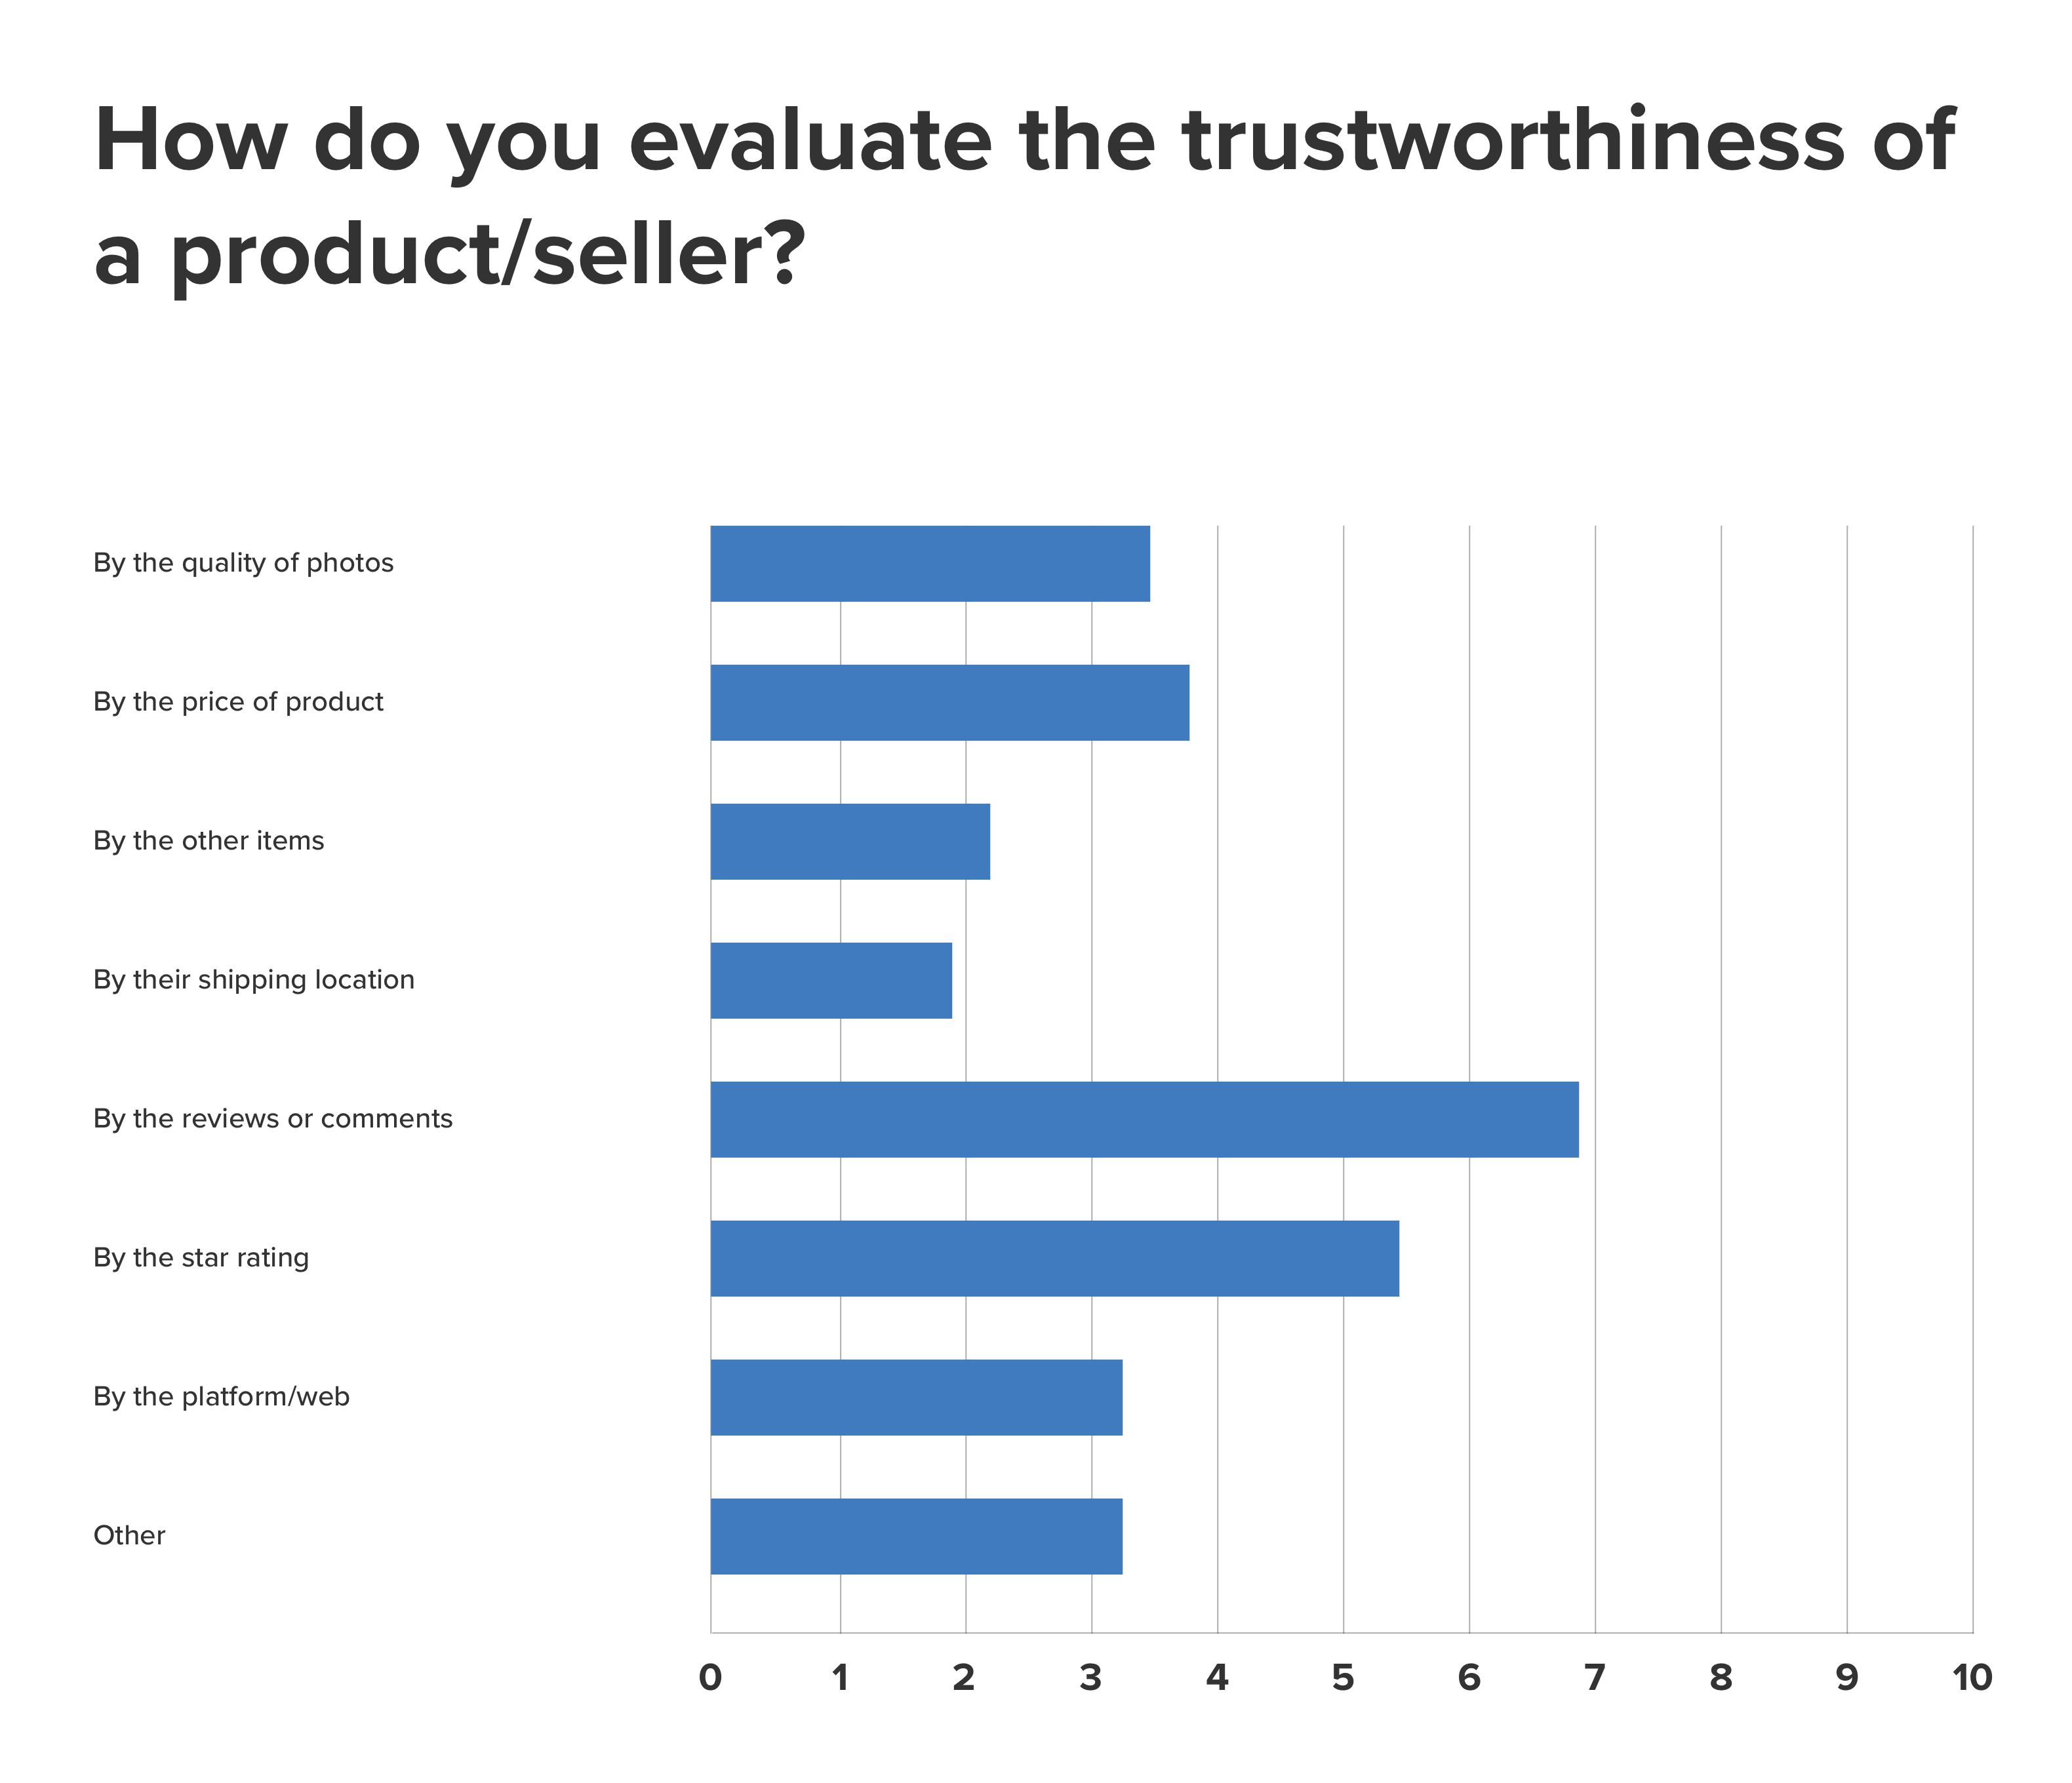 fake-footwear-trustworthiness-question-1